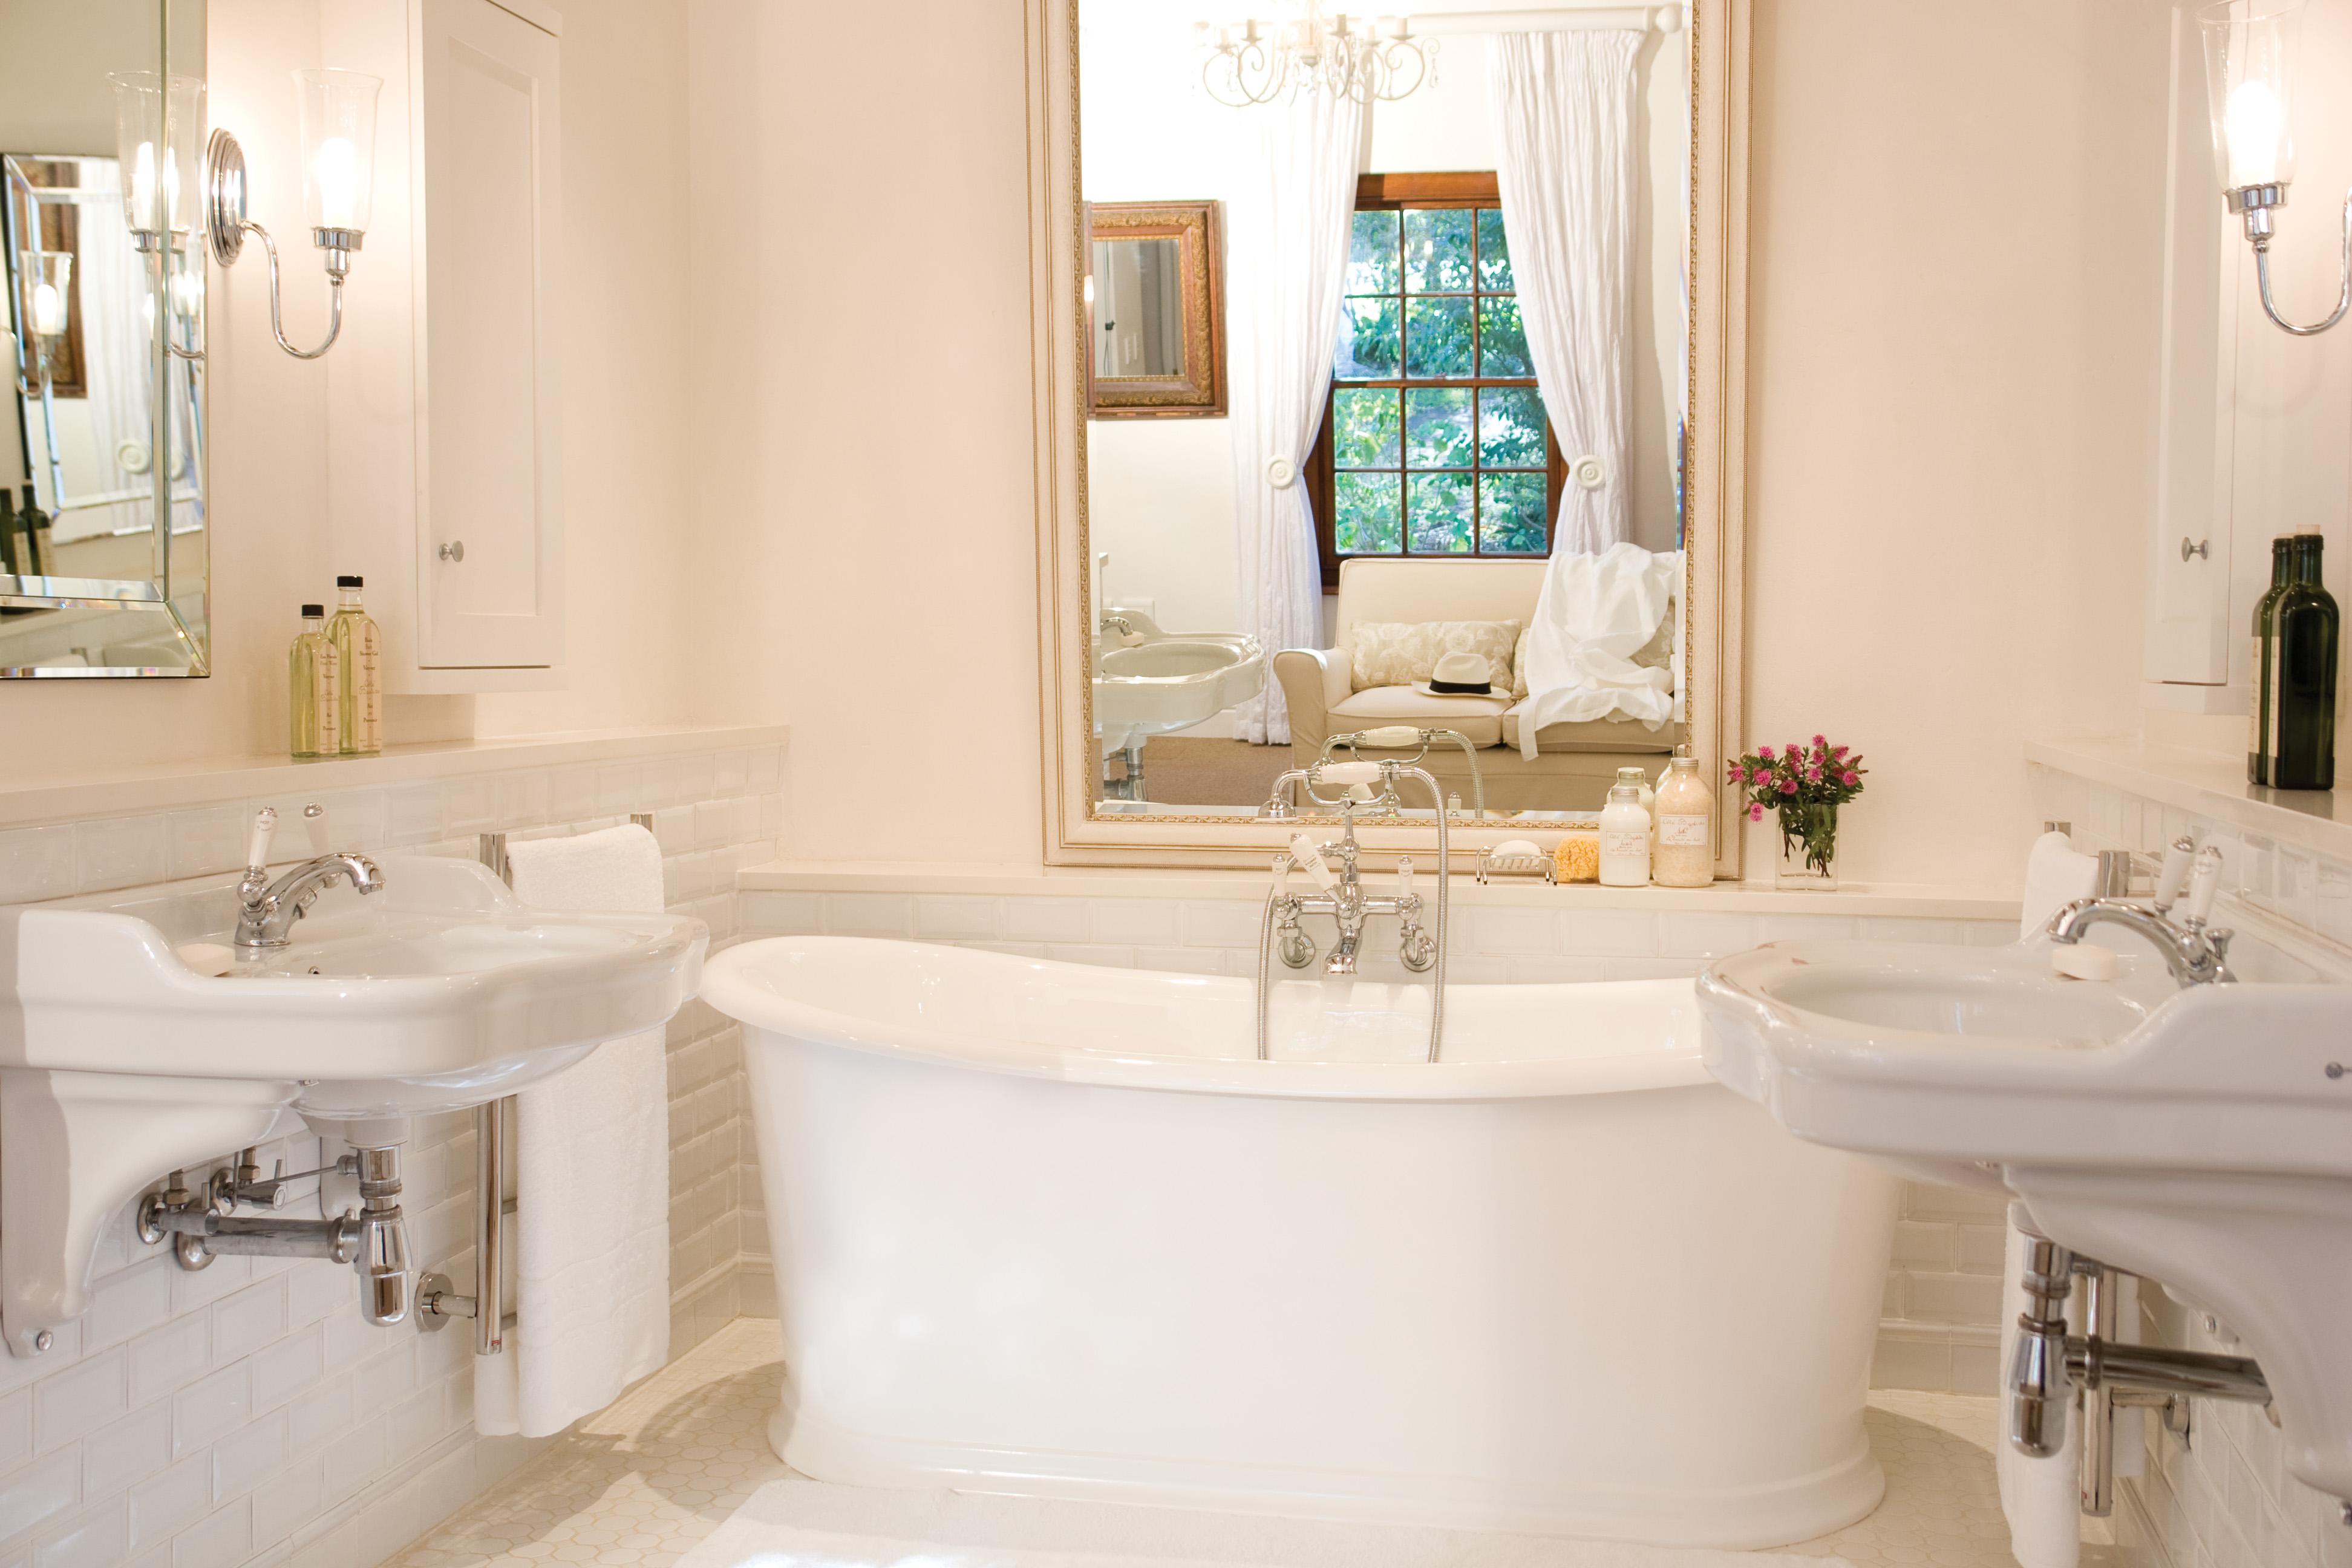 how to: create a timeless bathroom